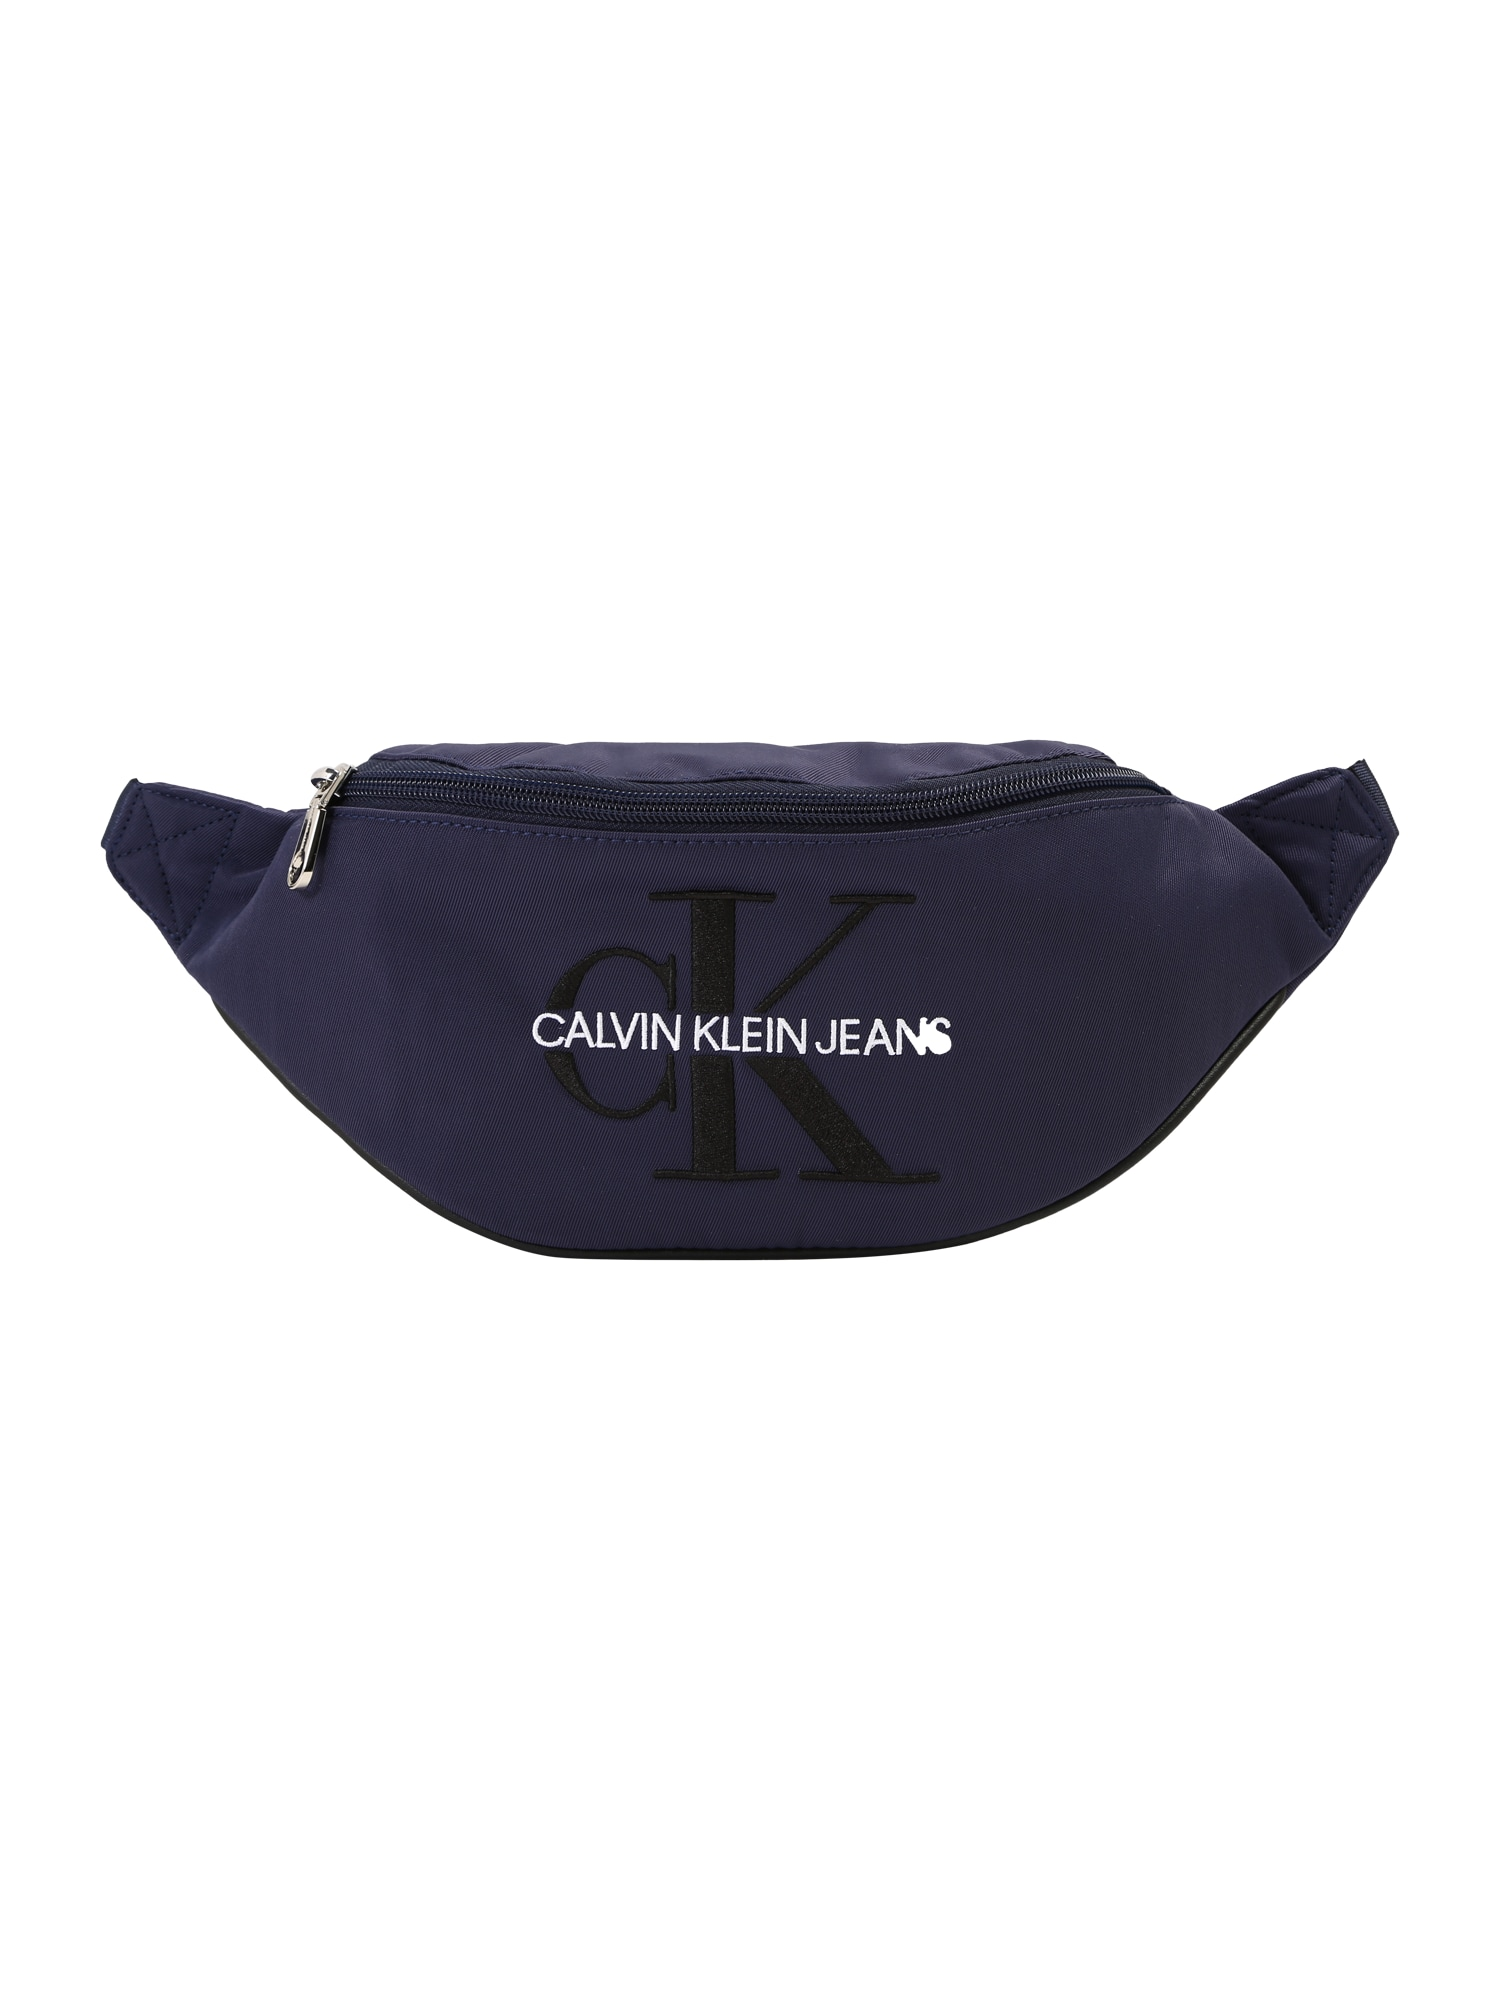 Calvin Klein Jeans Ledvinka 'MONOGRAM STREET PACK'  námořnická modř